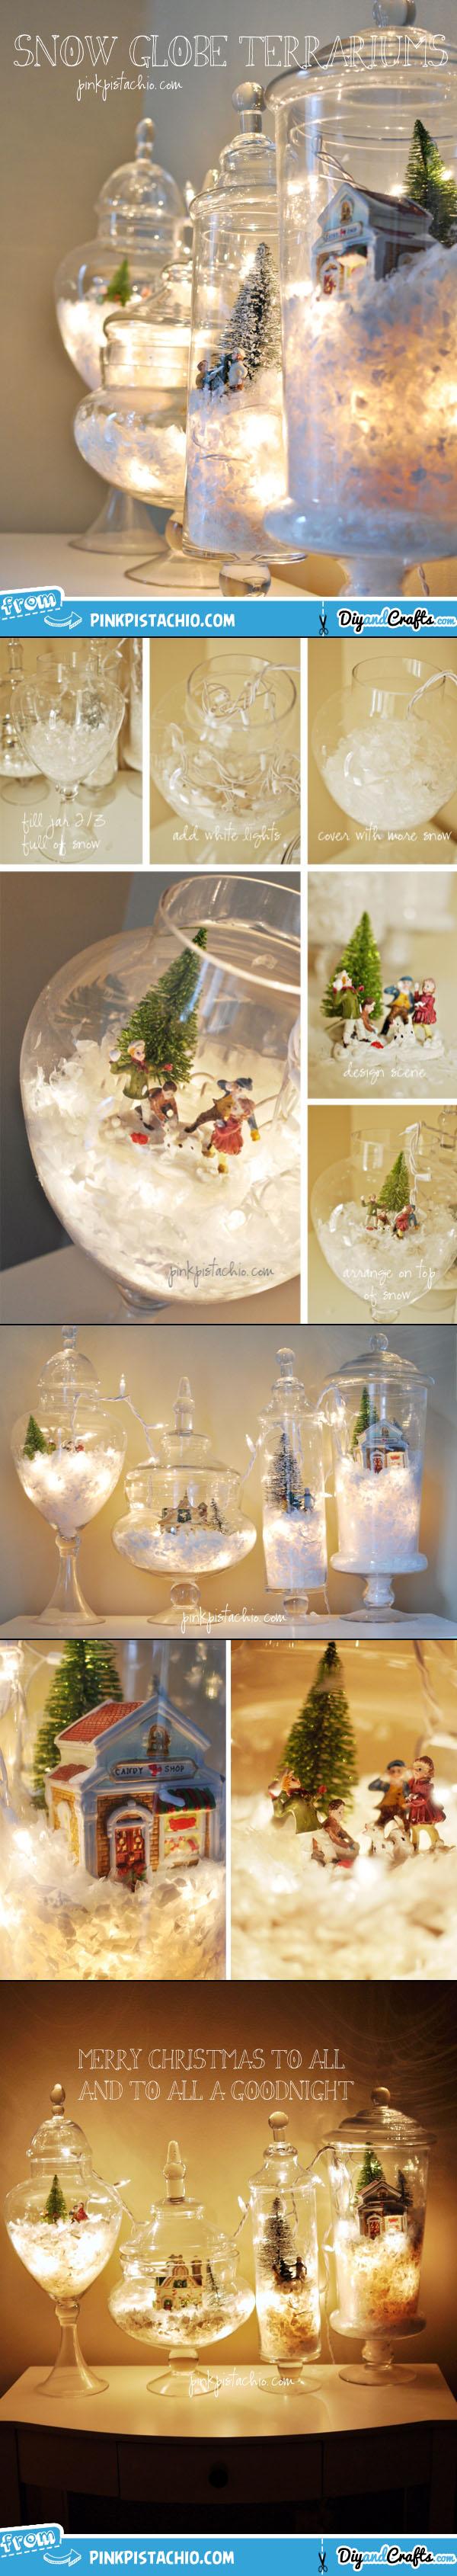 Snow Globe Terrariums | DIY